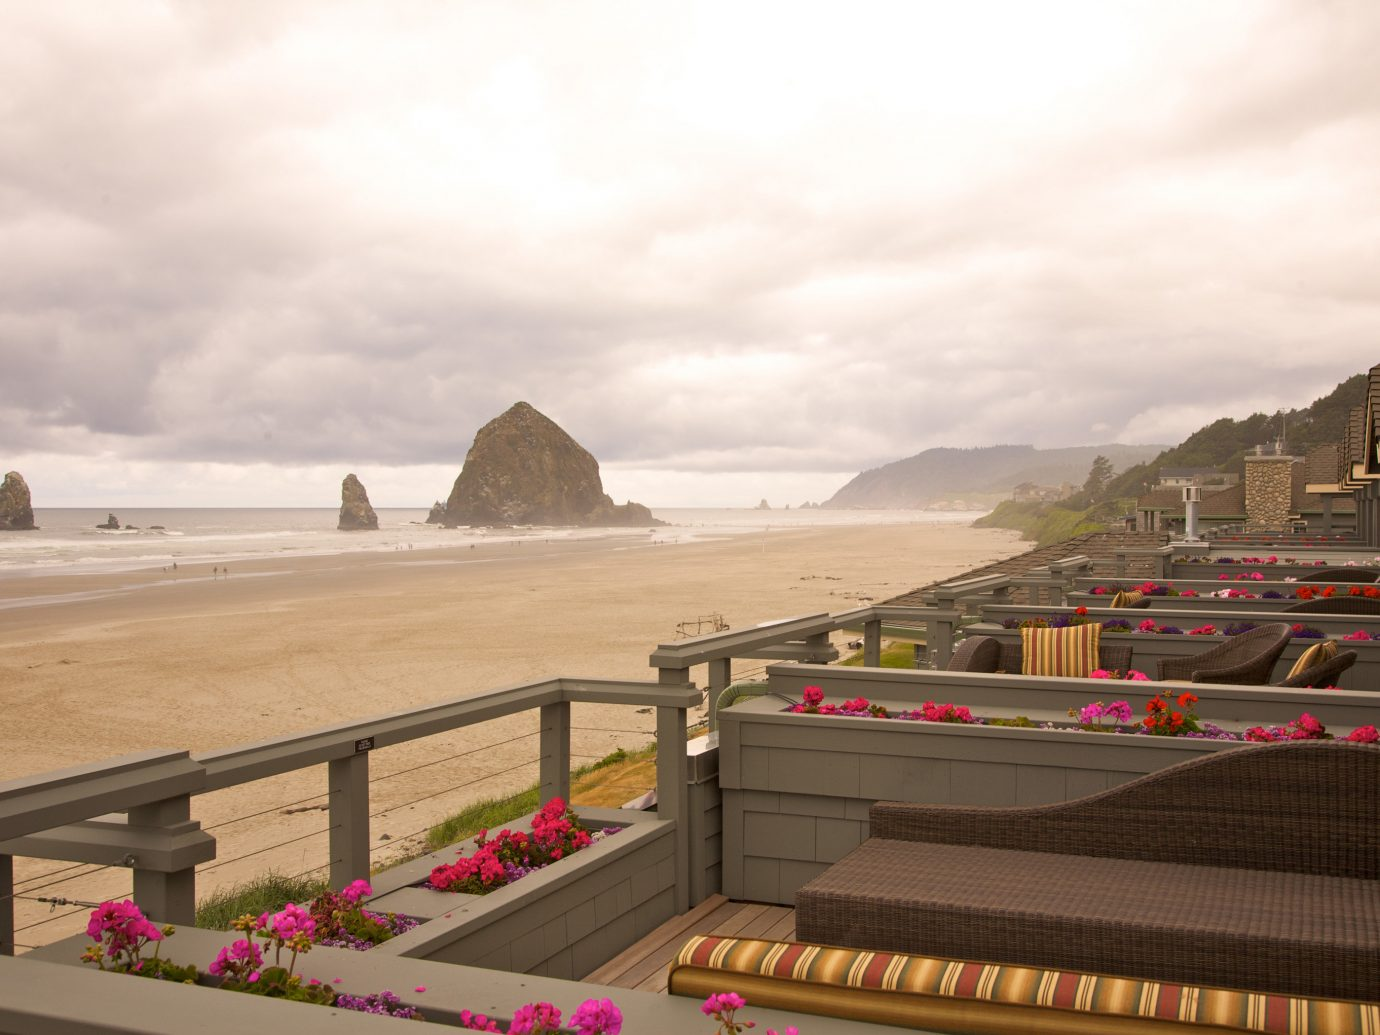 Deck at Stephanie Inn, Oregon overlooking the ocean